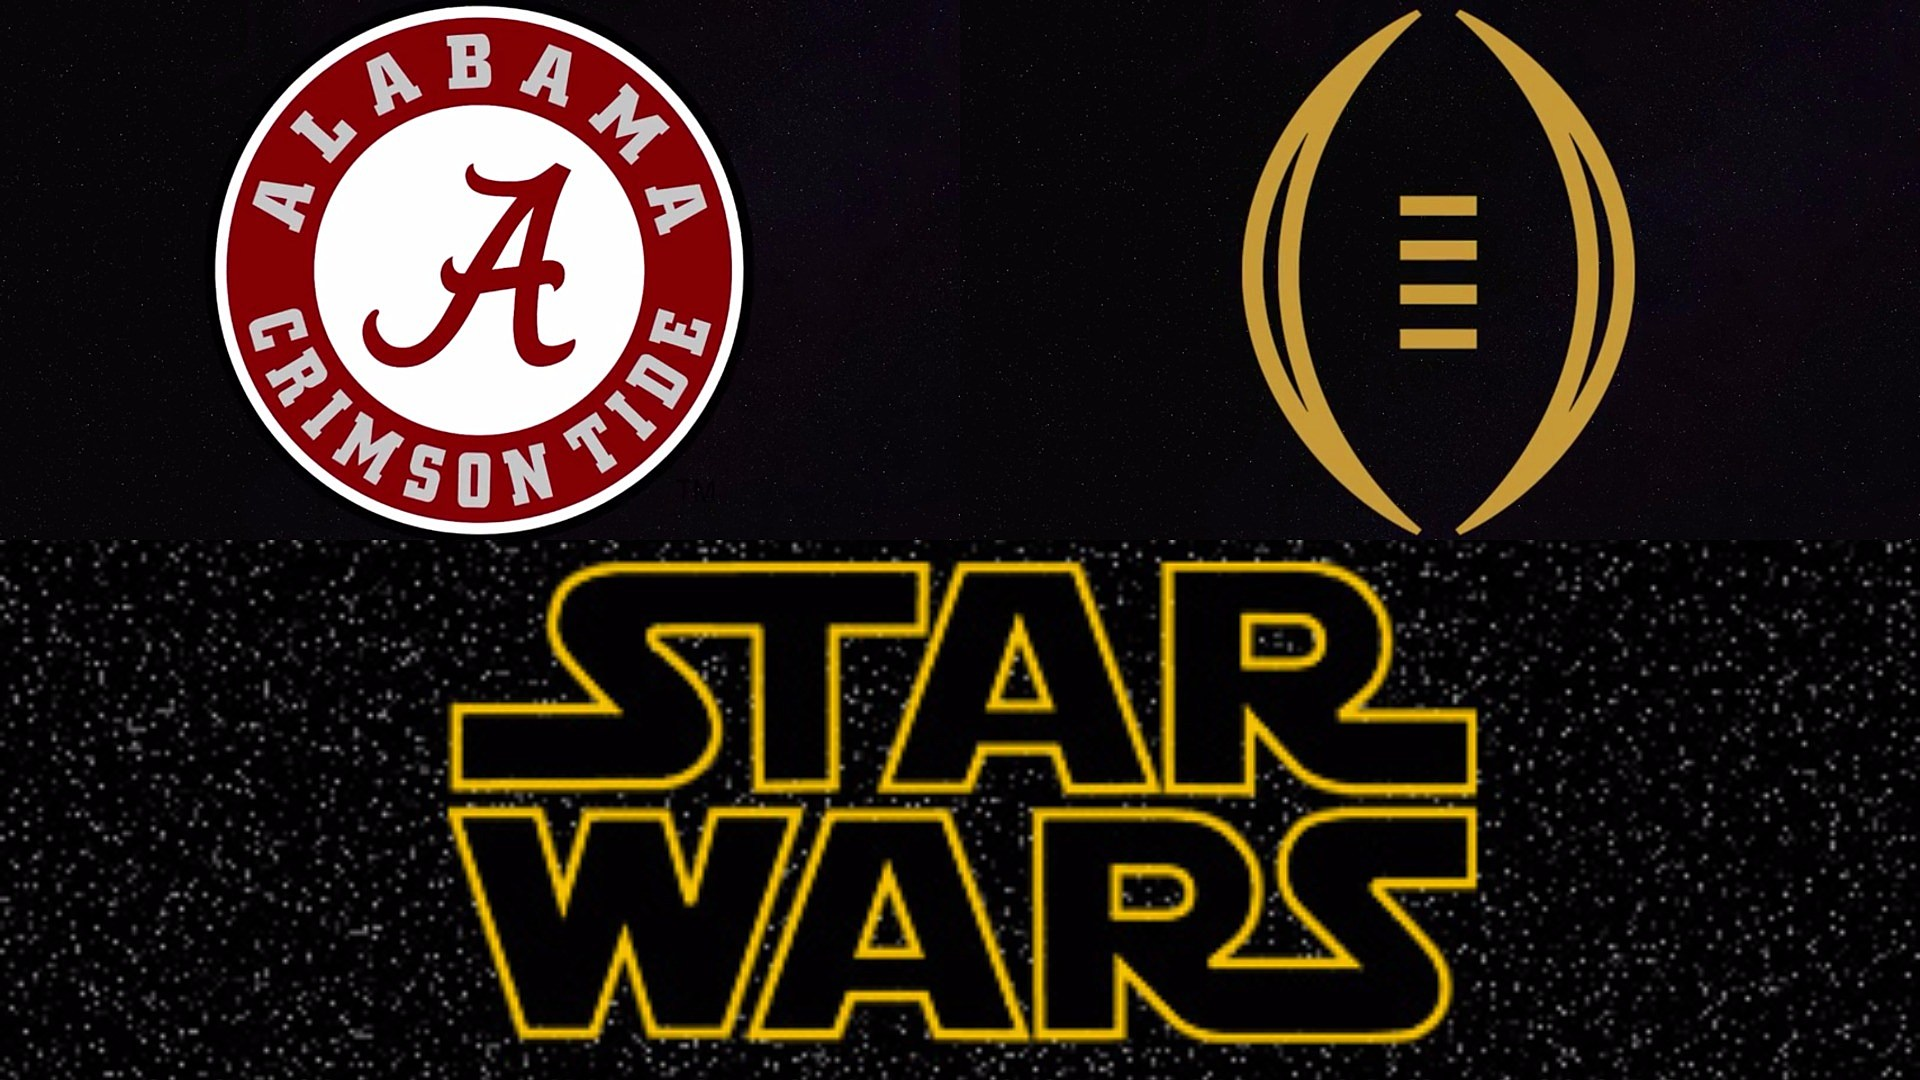 National Championship Hype Video Alabama Meets Star Wars